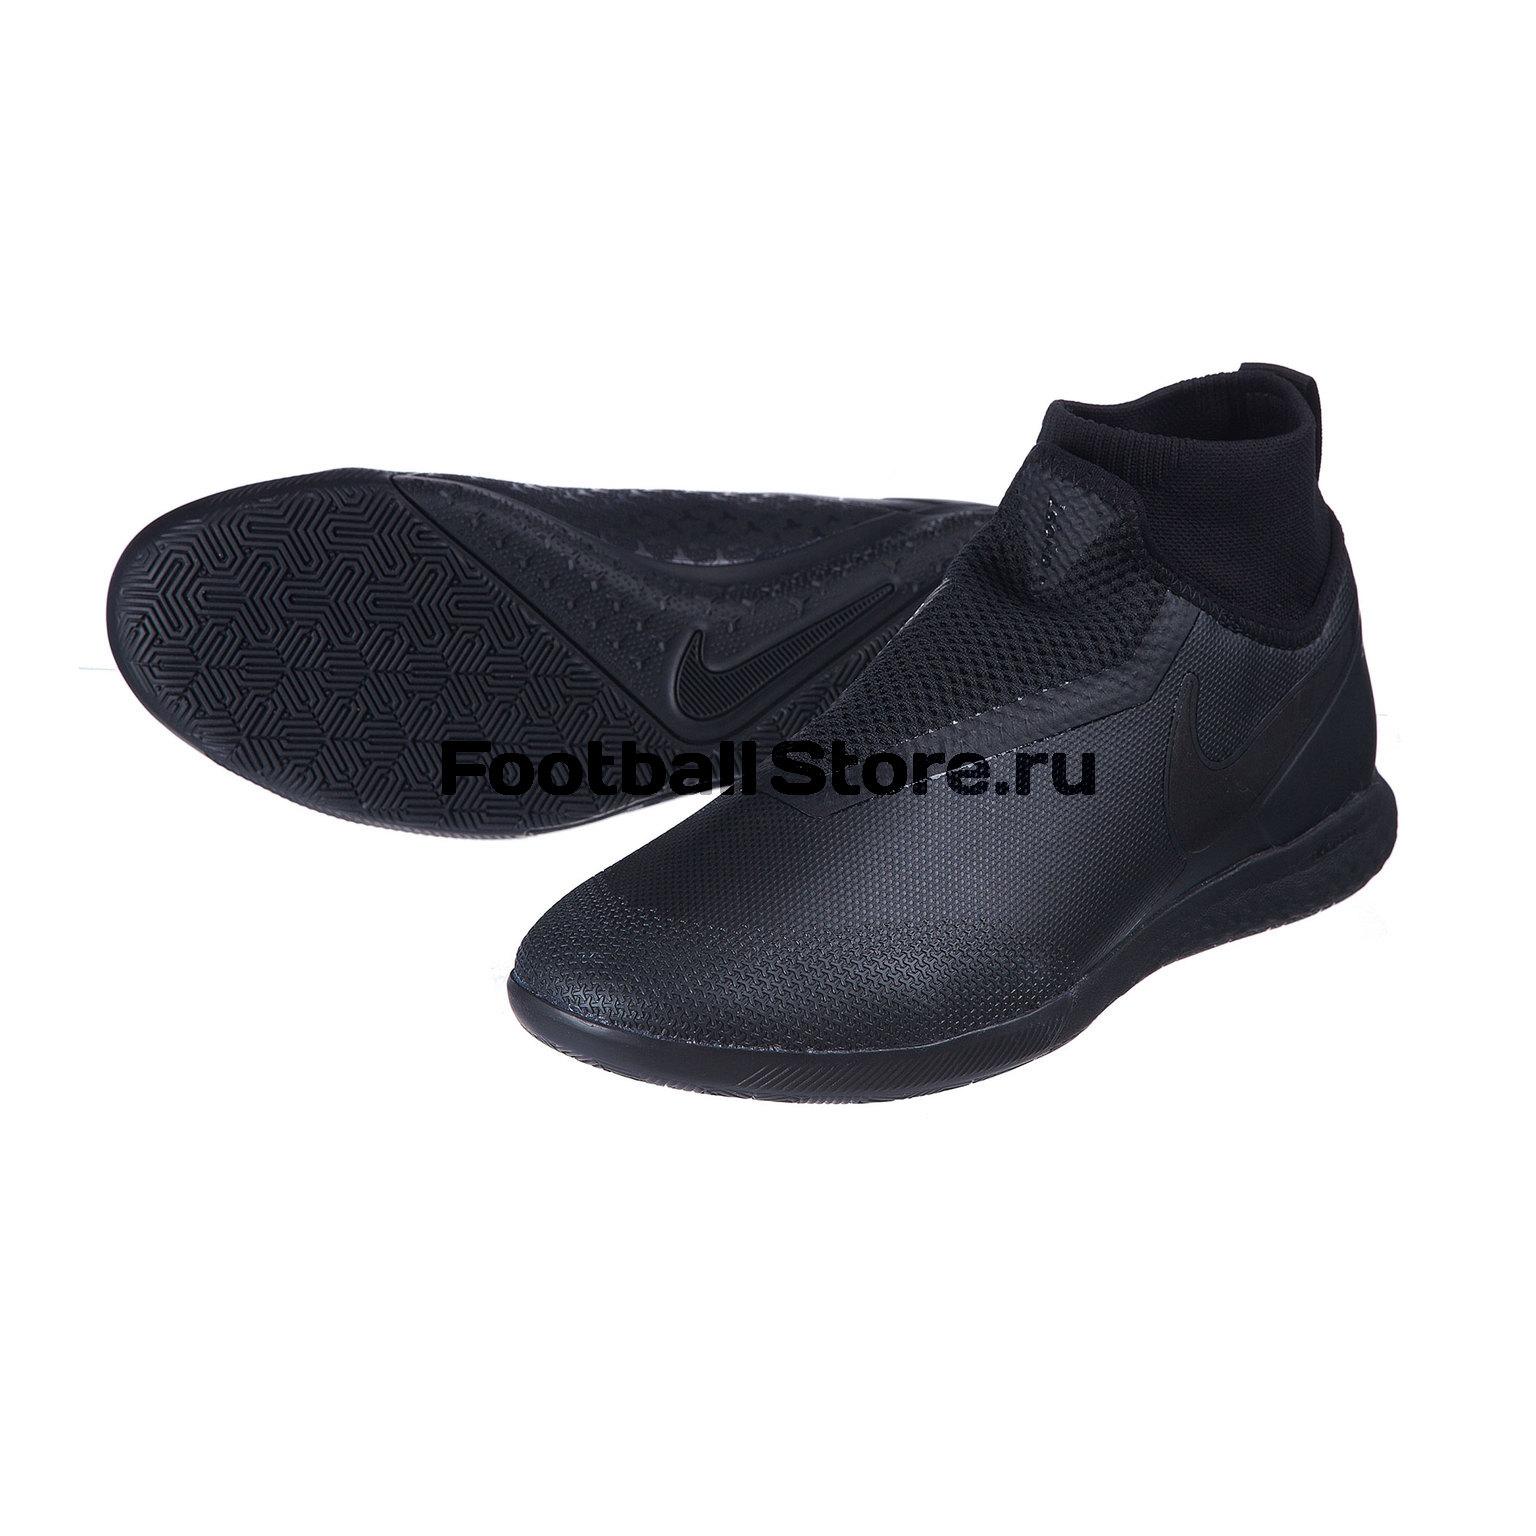 Футзалки Nike React Phantom Vision Pro DF IC AO3276-001 обувь для зала nike phantom vision club df ic ao3271 001